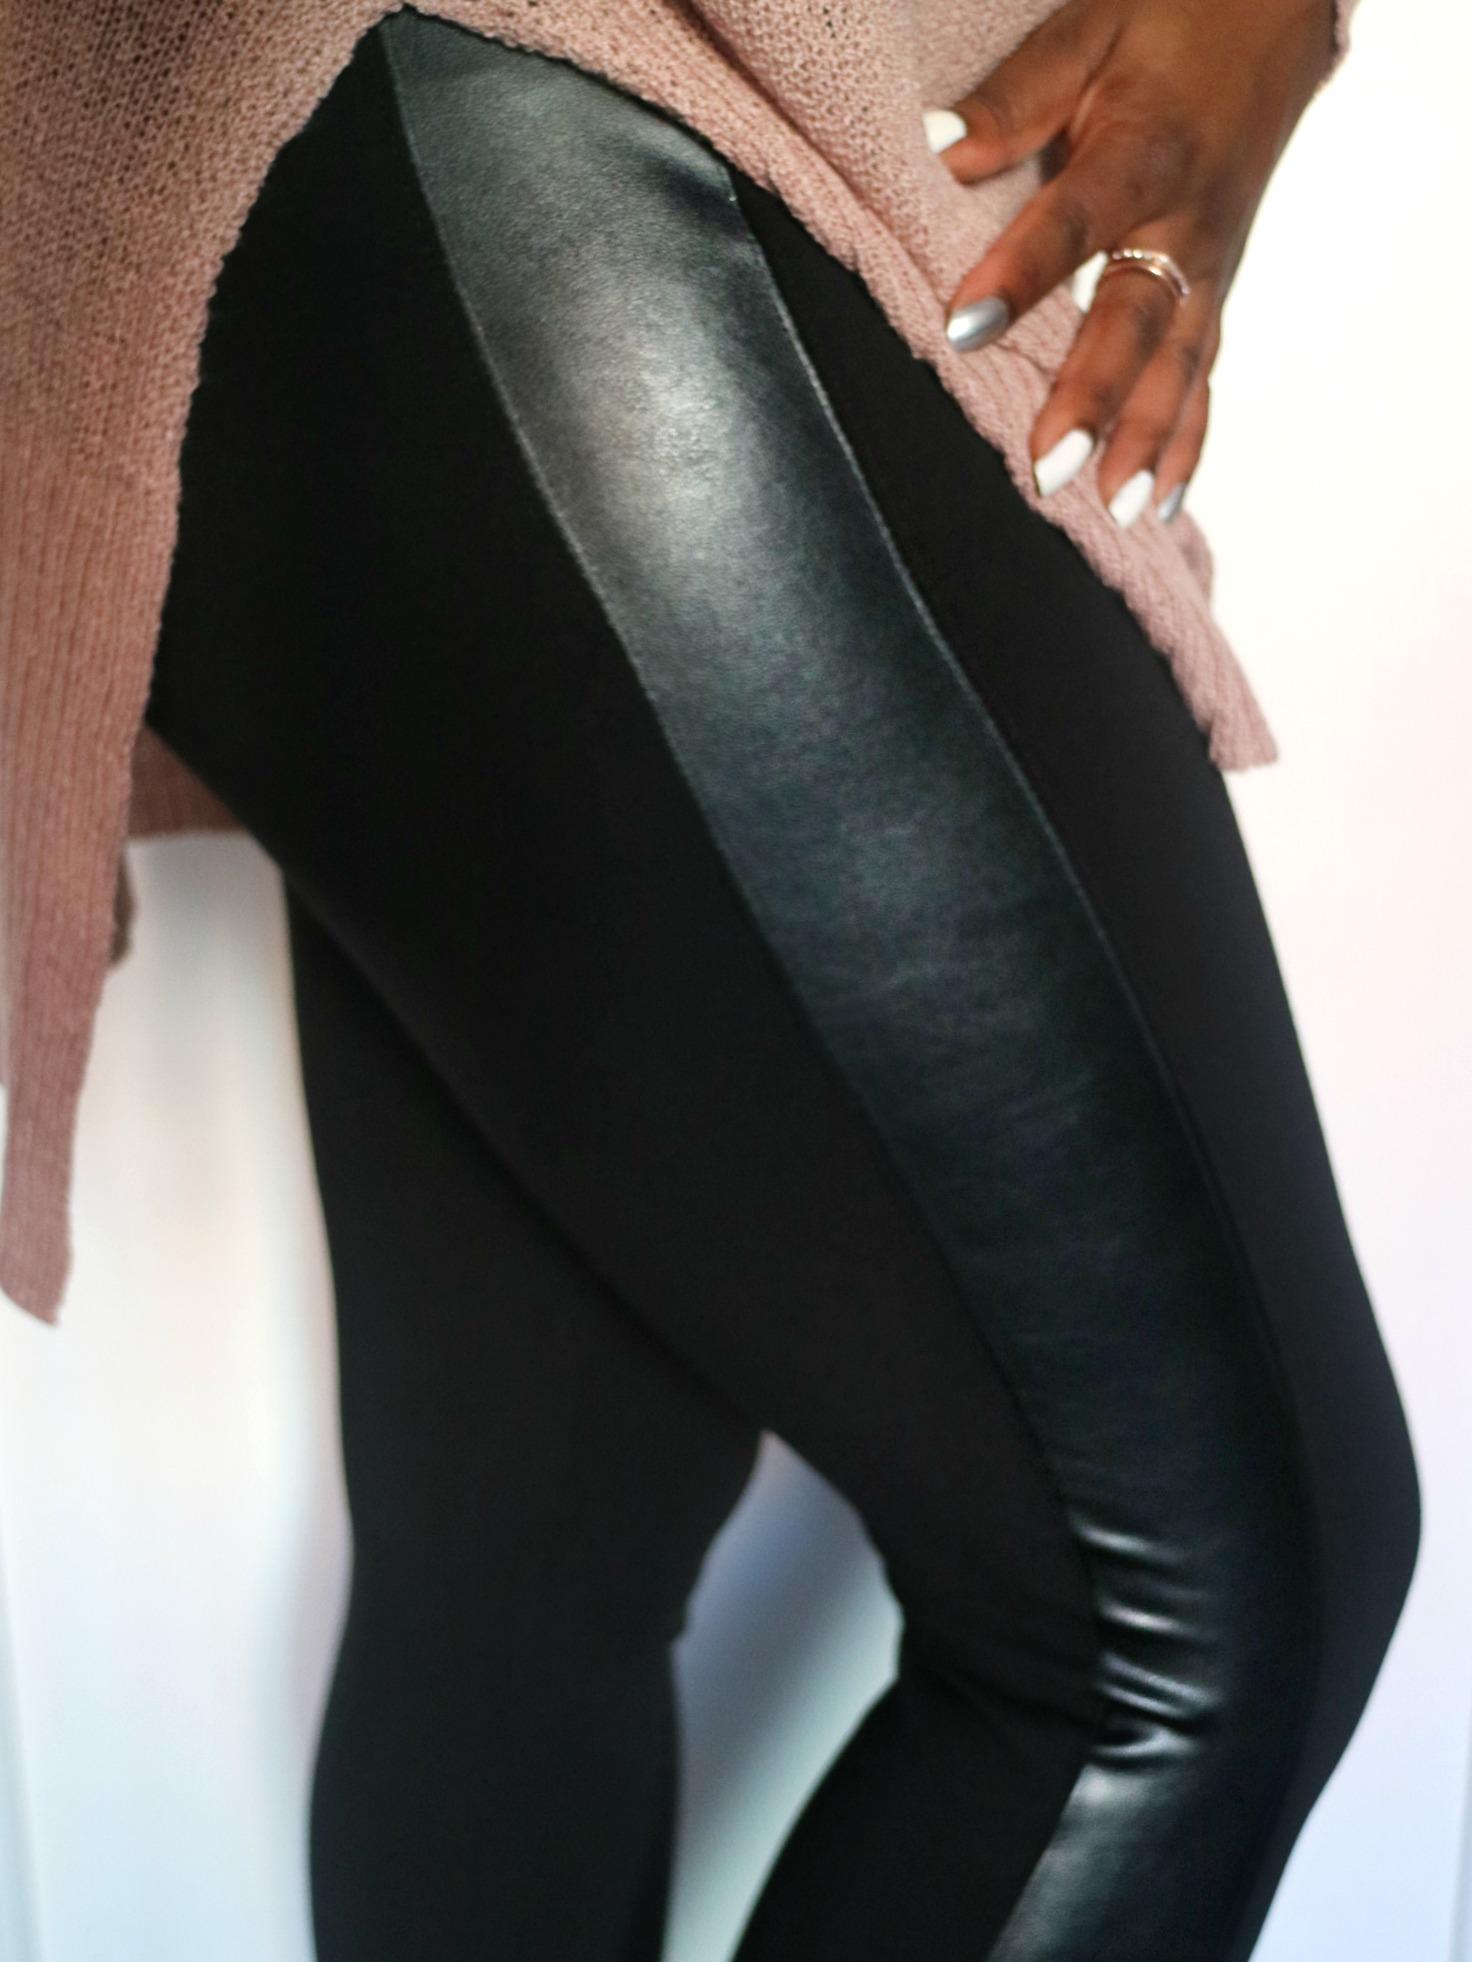 Leggings - Naomi High Rise leggings $39.95 CAD BOGO 50% off